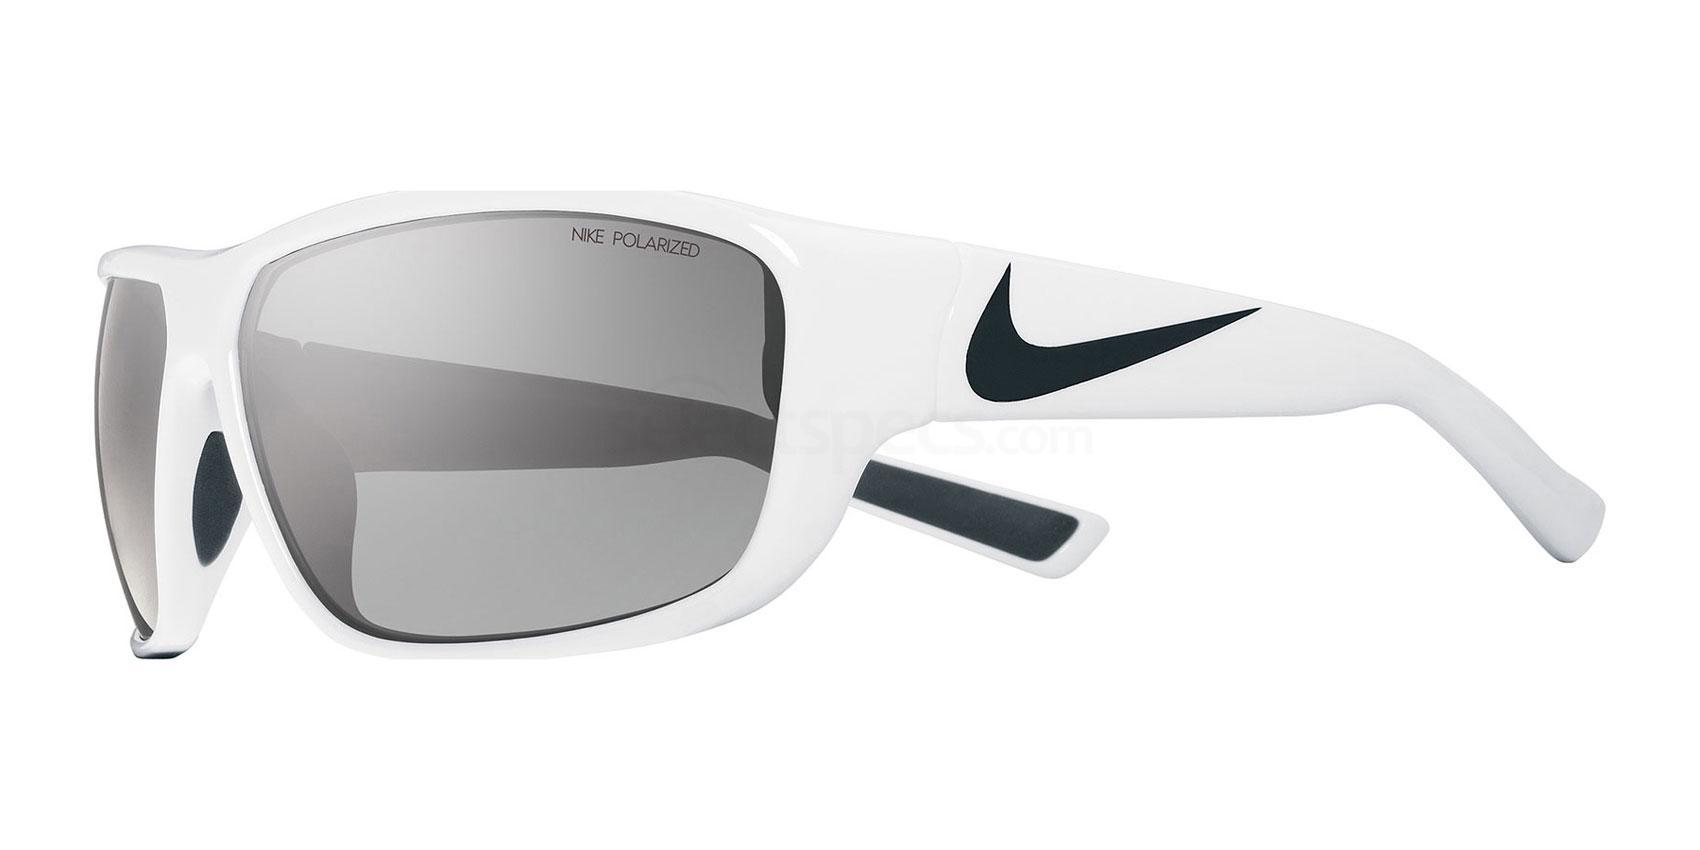 104 NIKE MERCURIAL 8.0 P EV0782 Sunglasses, Nike